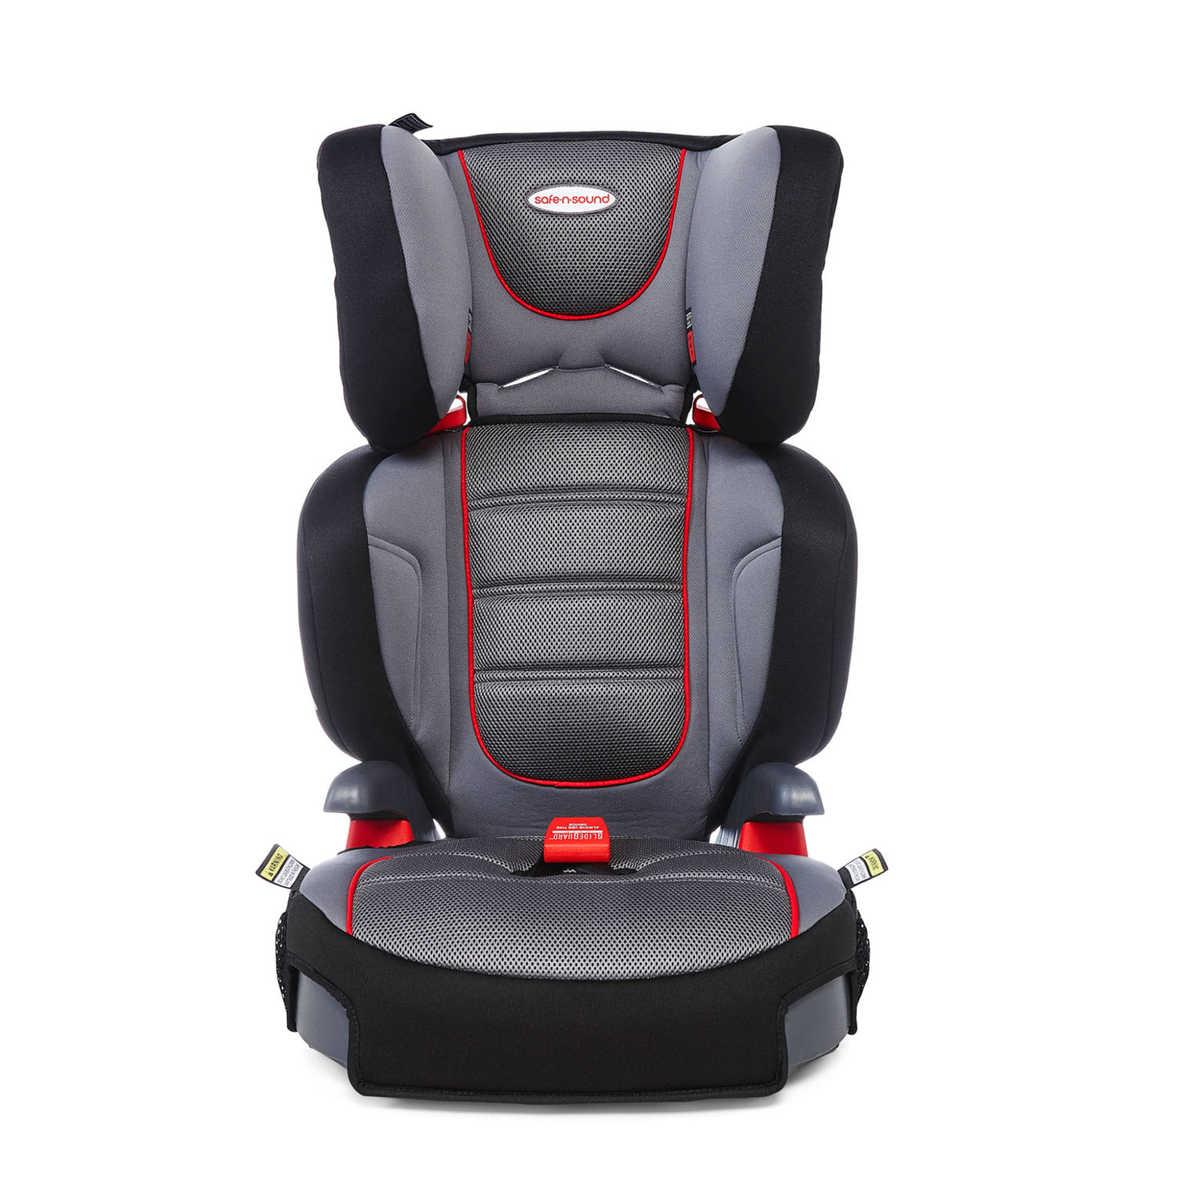 Safe N Sound Hi-Grow Booster Seat